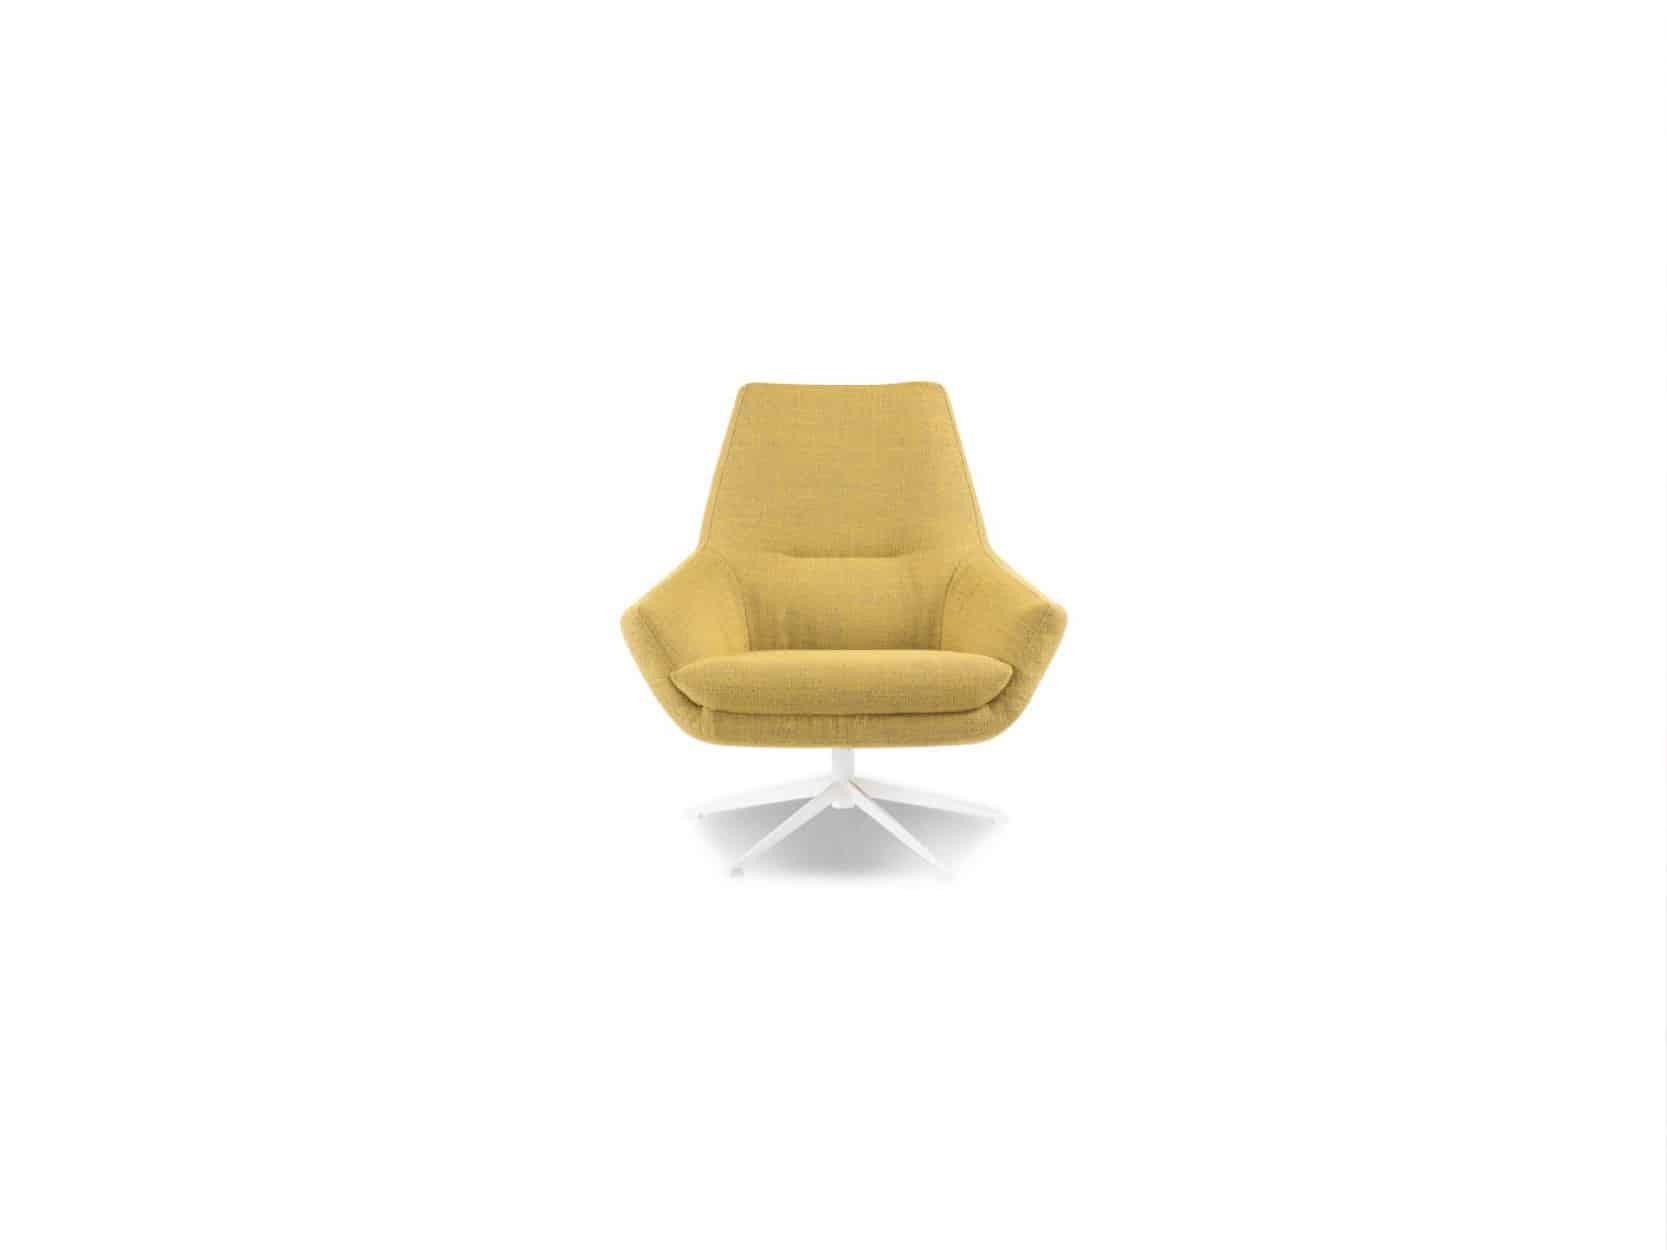 Movani fauteuil Smile pa